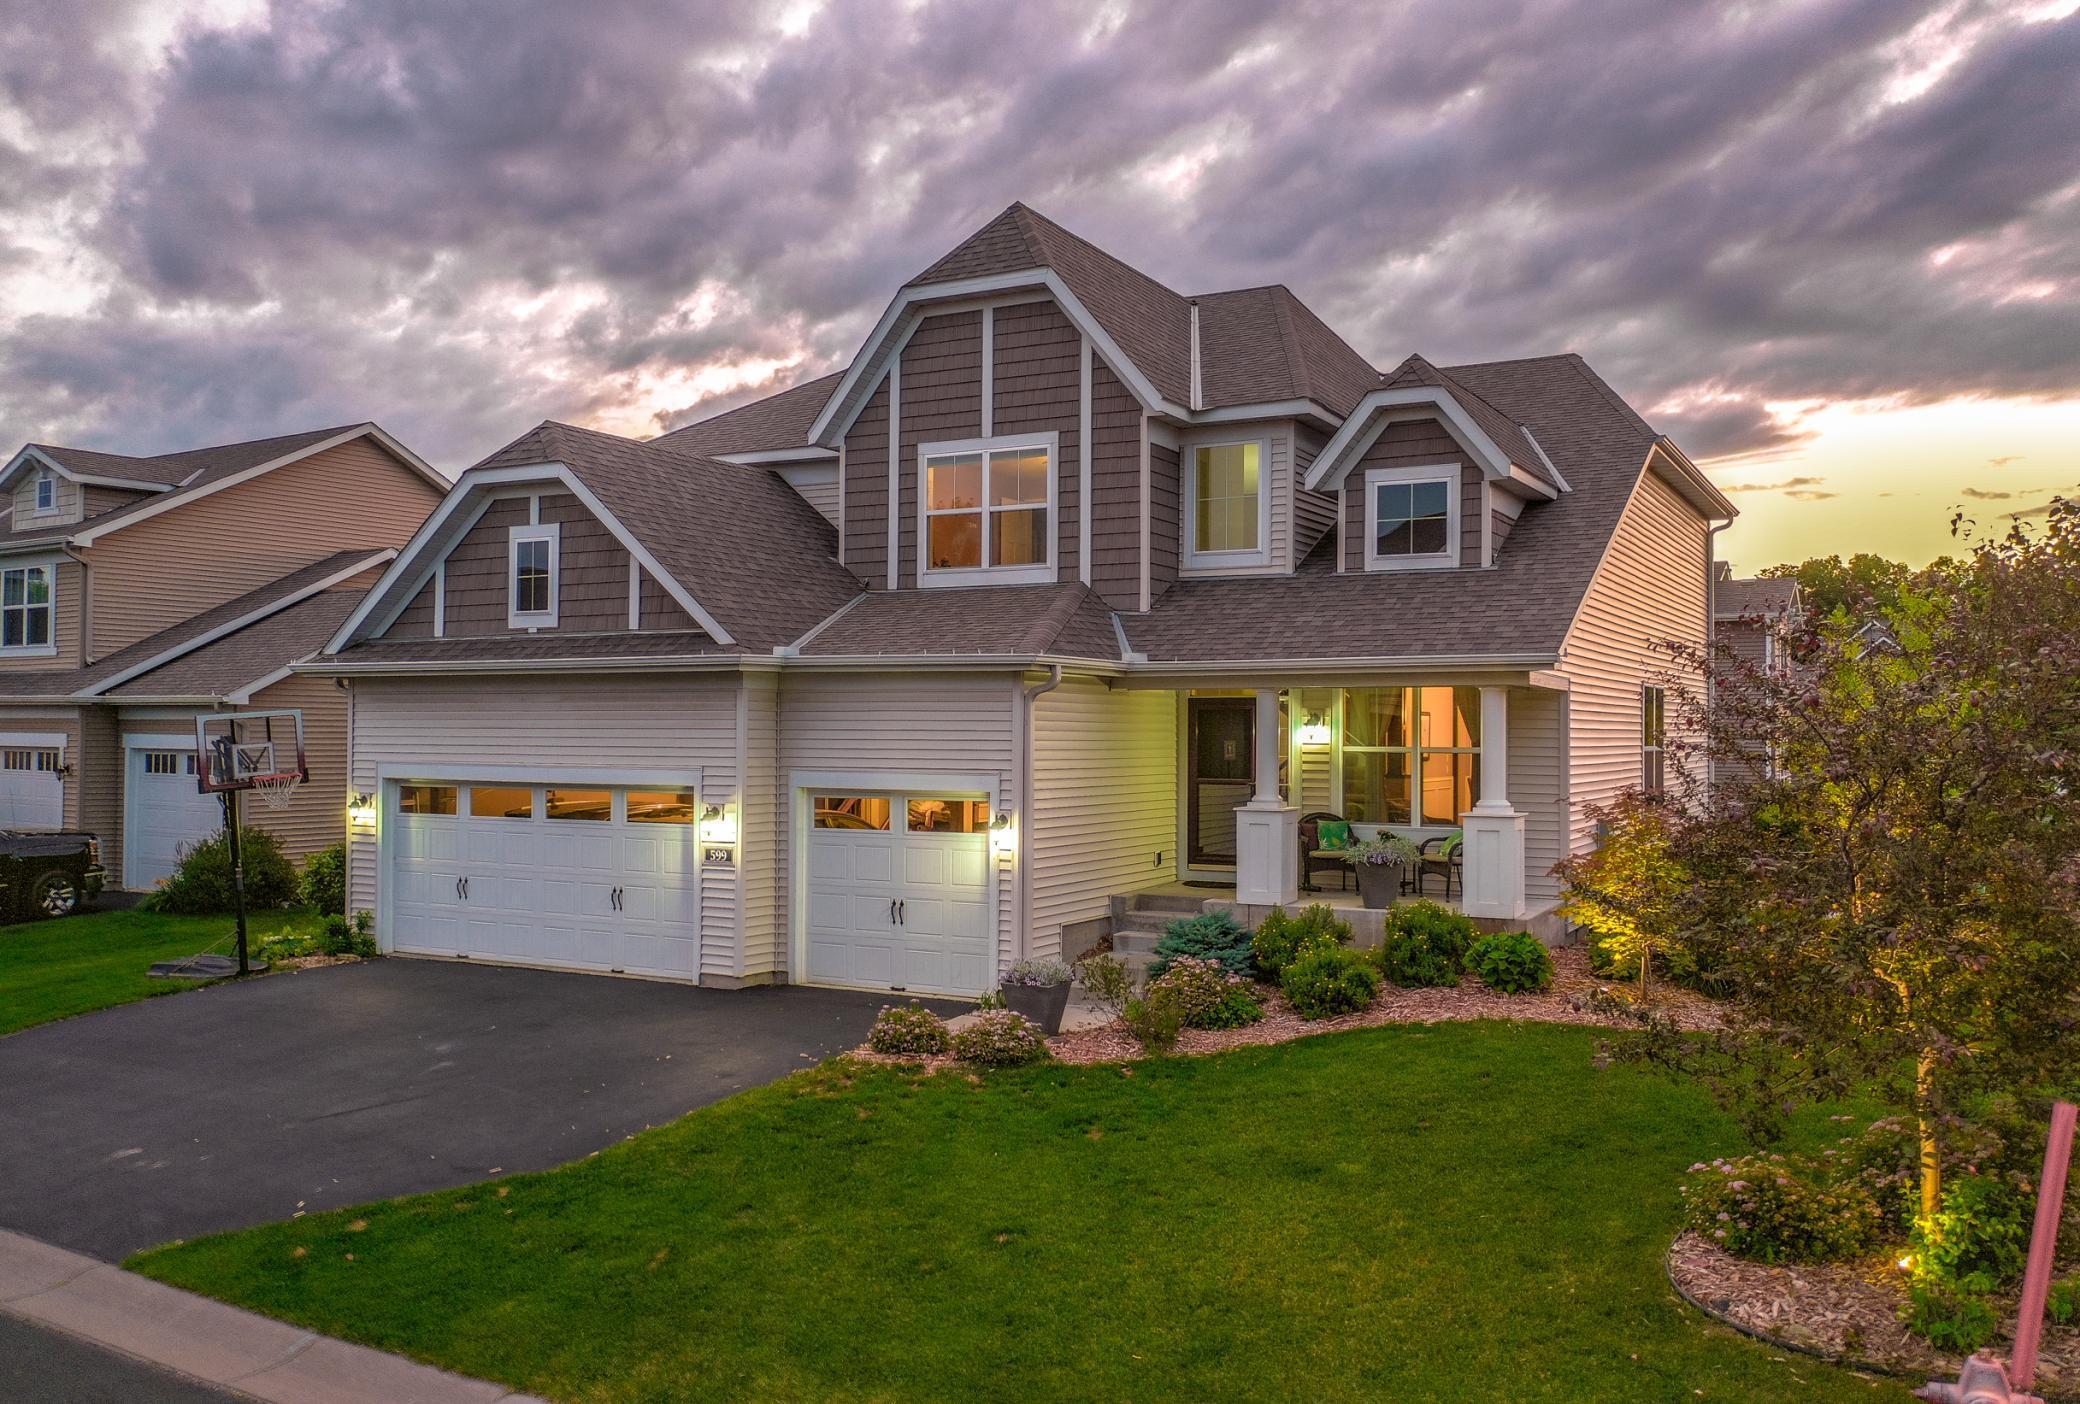 599 Eastgate Property Photo - Mahtomedi, MN real estate listing